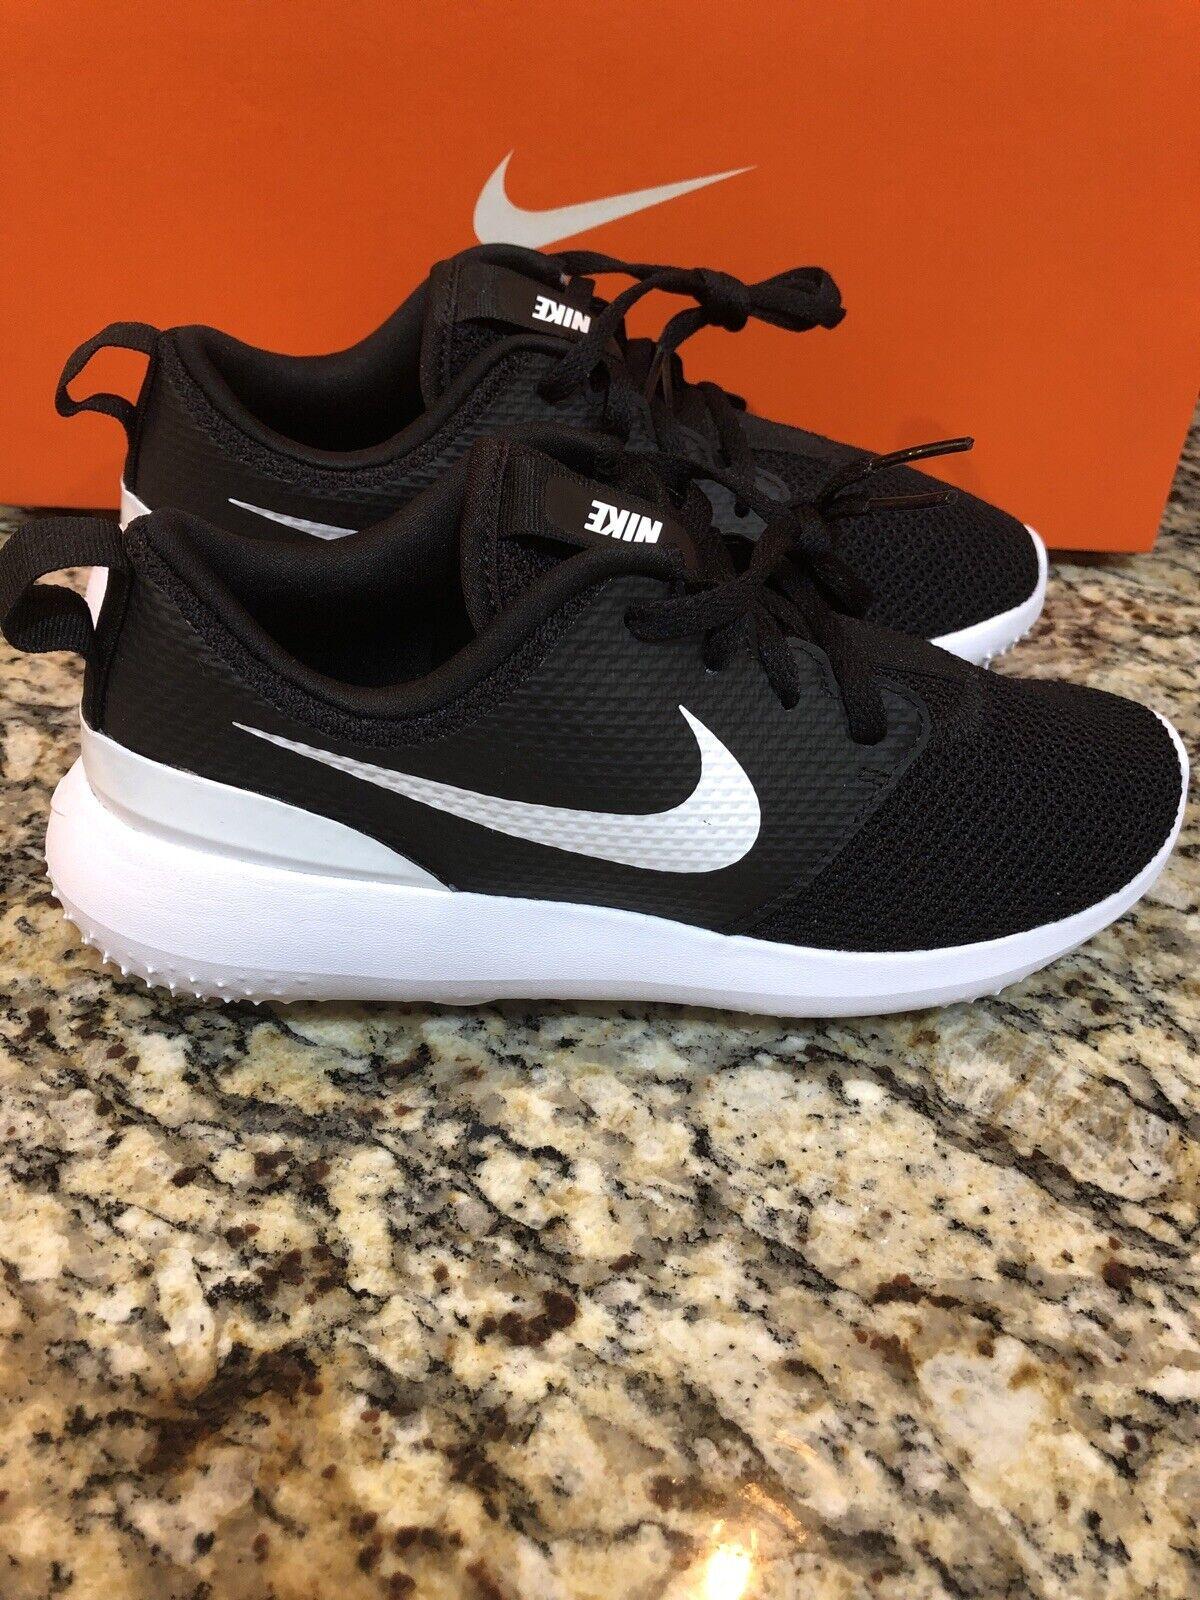 New Nike Youth Roshe G JR Golf Shoes